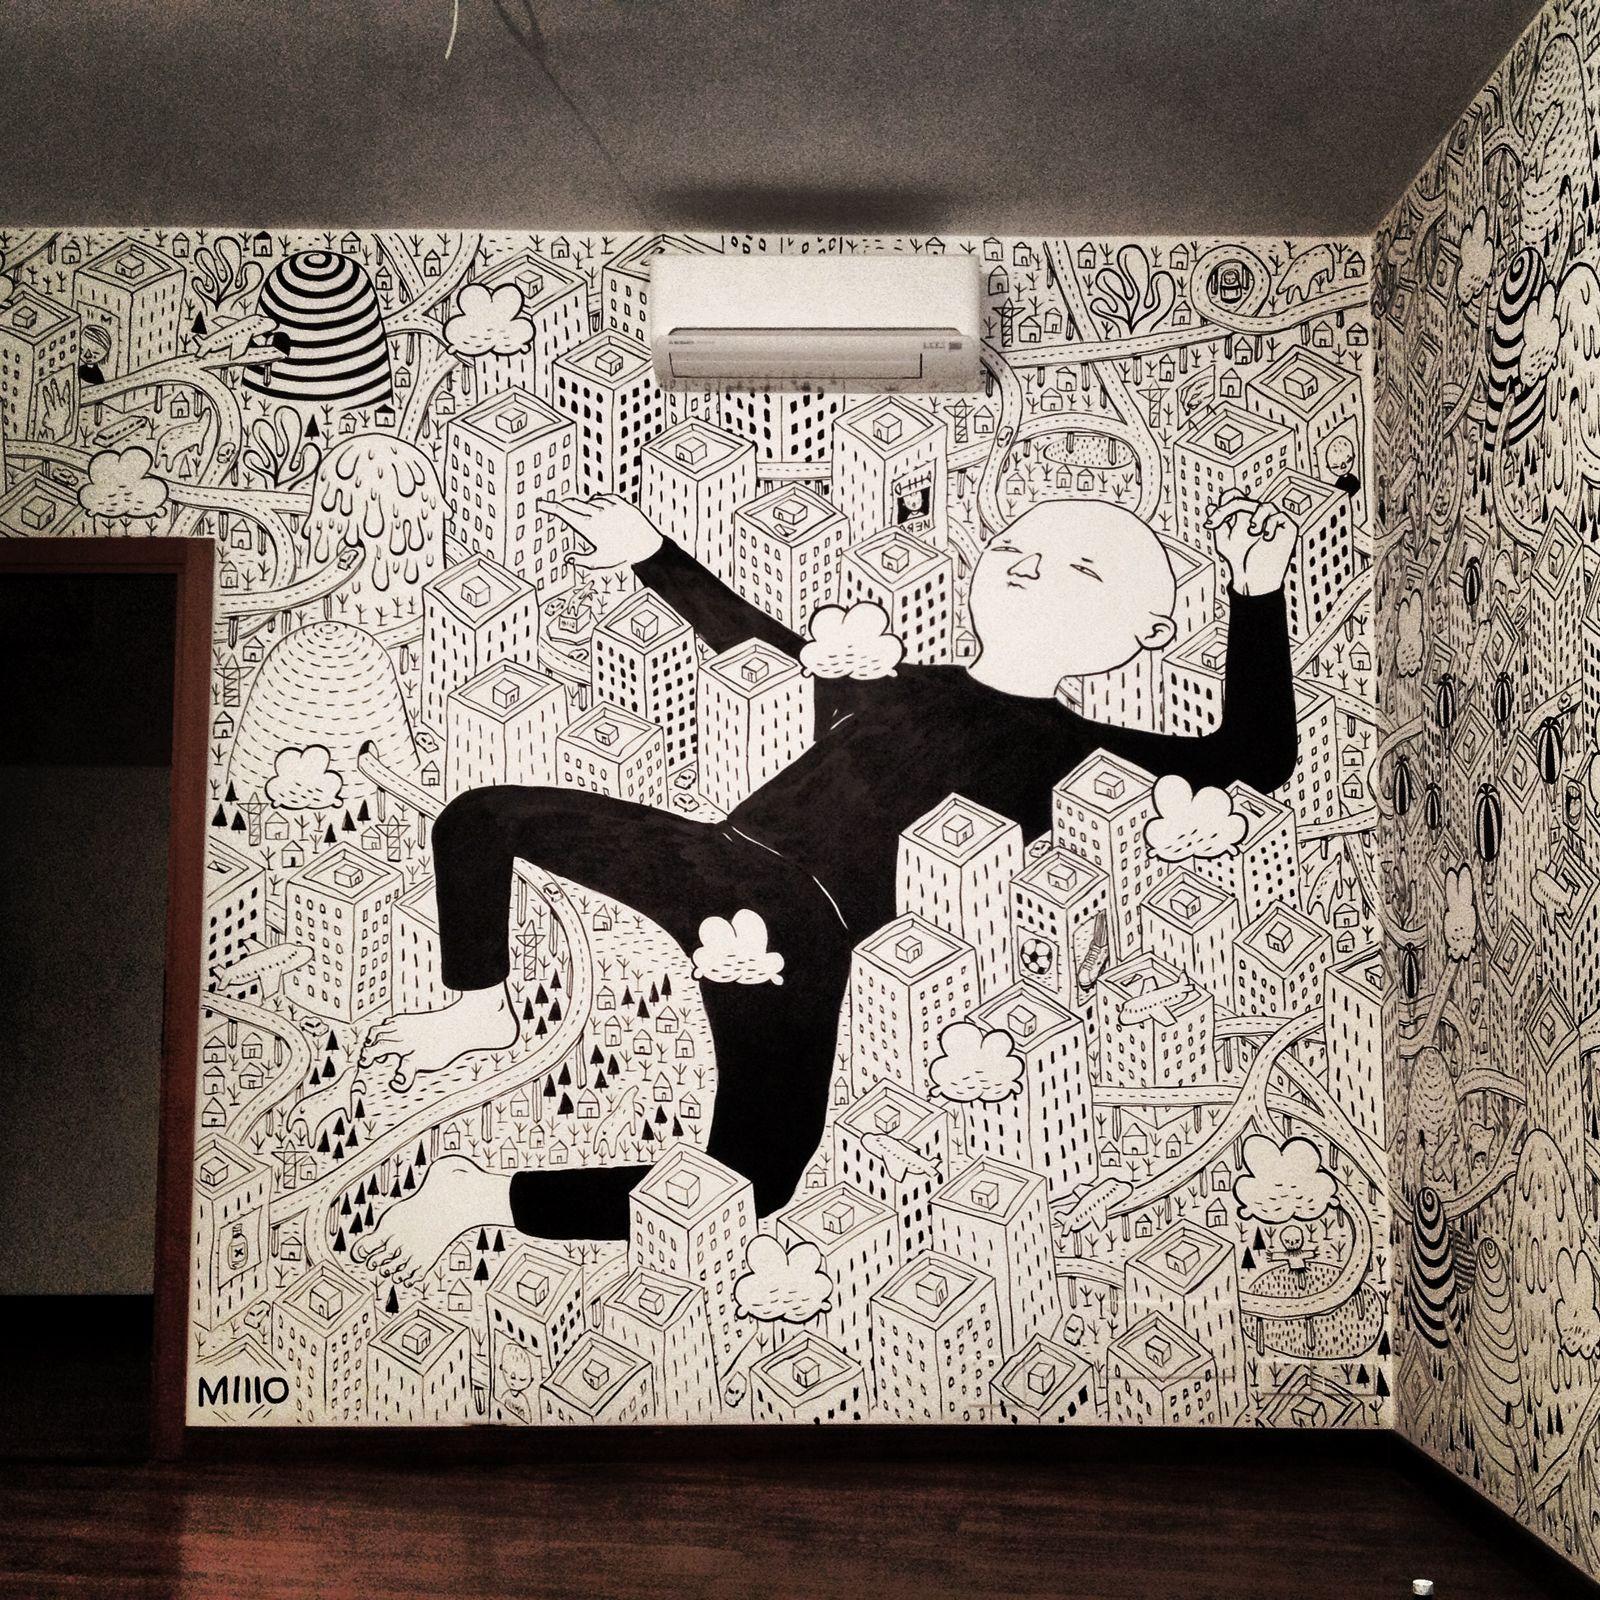 Indoors by francesco camillo